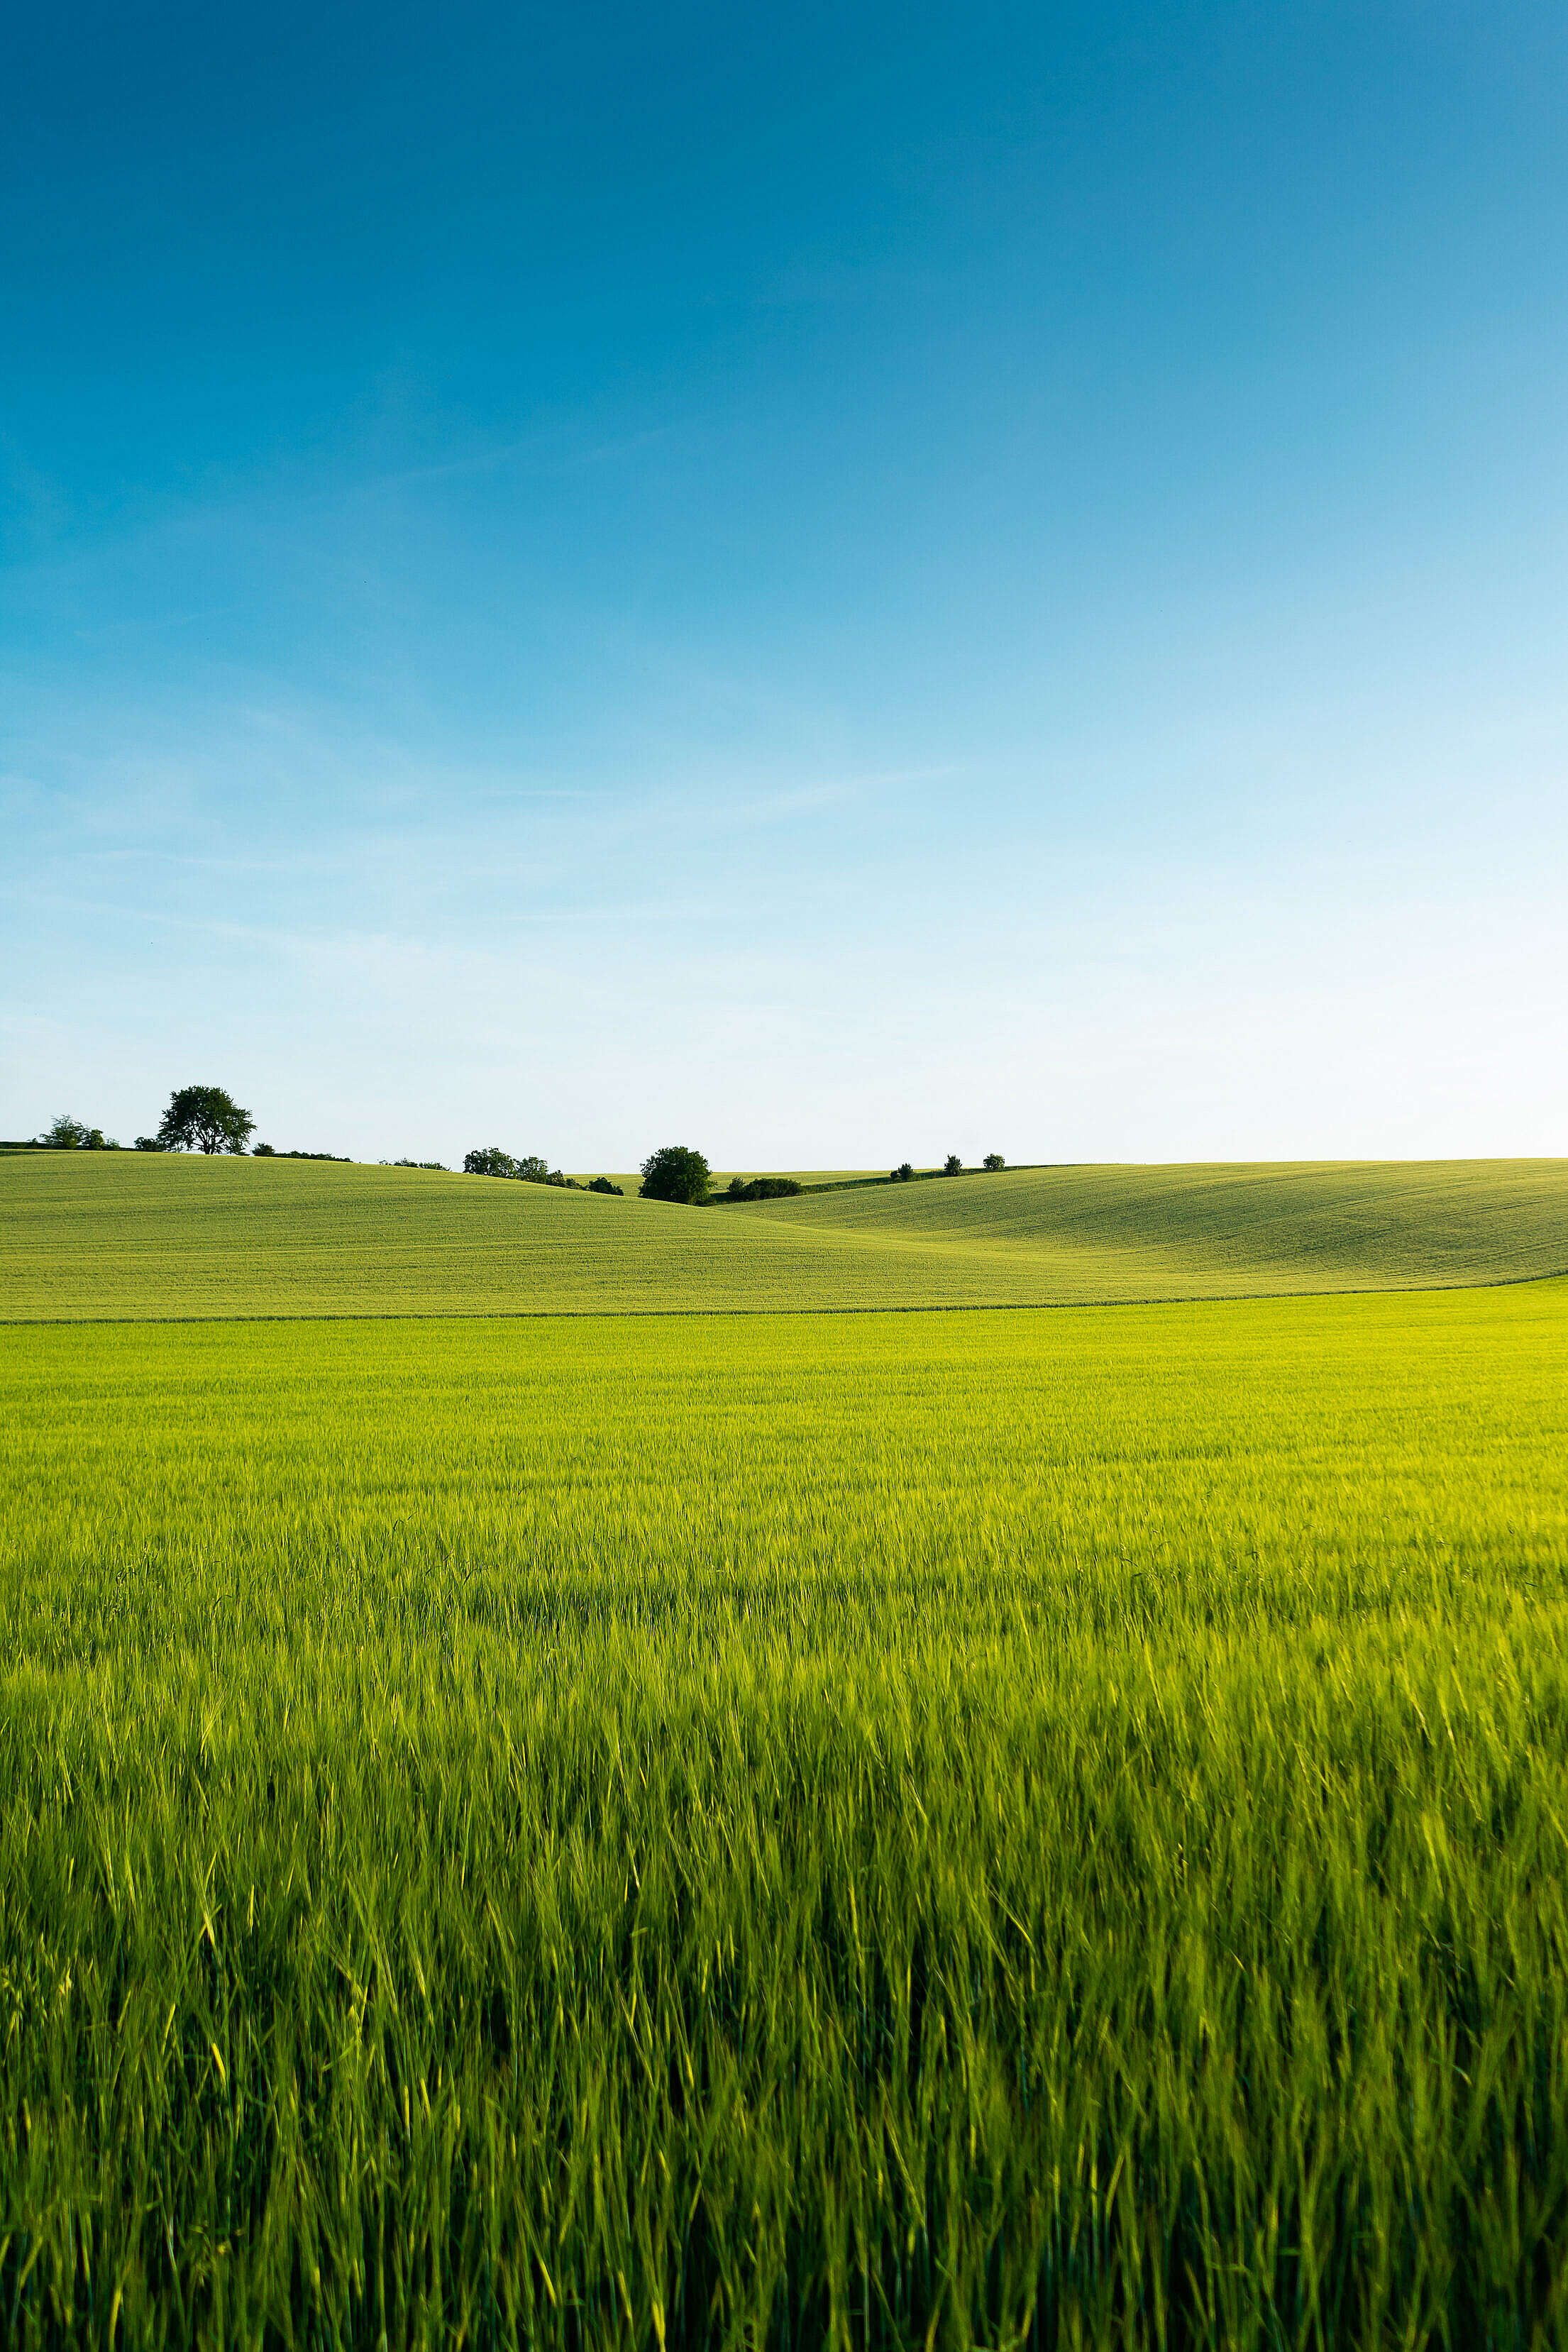 Beautiful Green Wheat Field Free Stock Photo